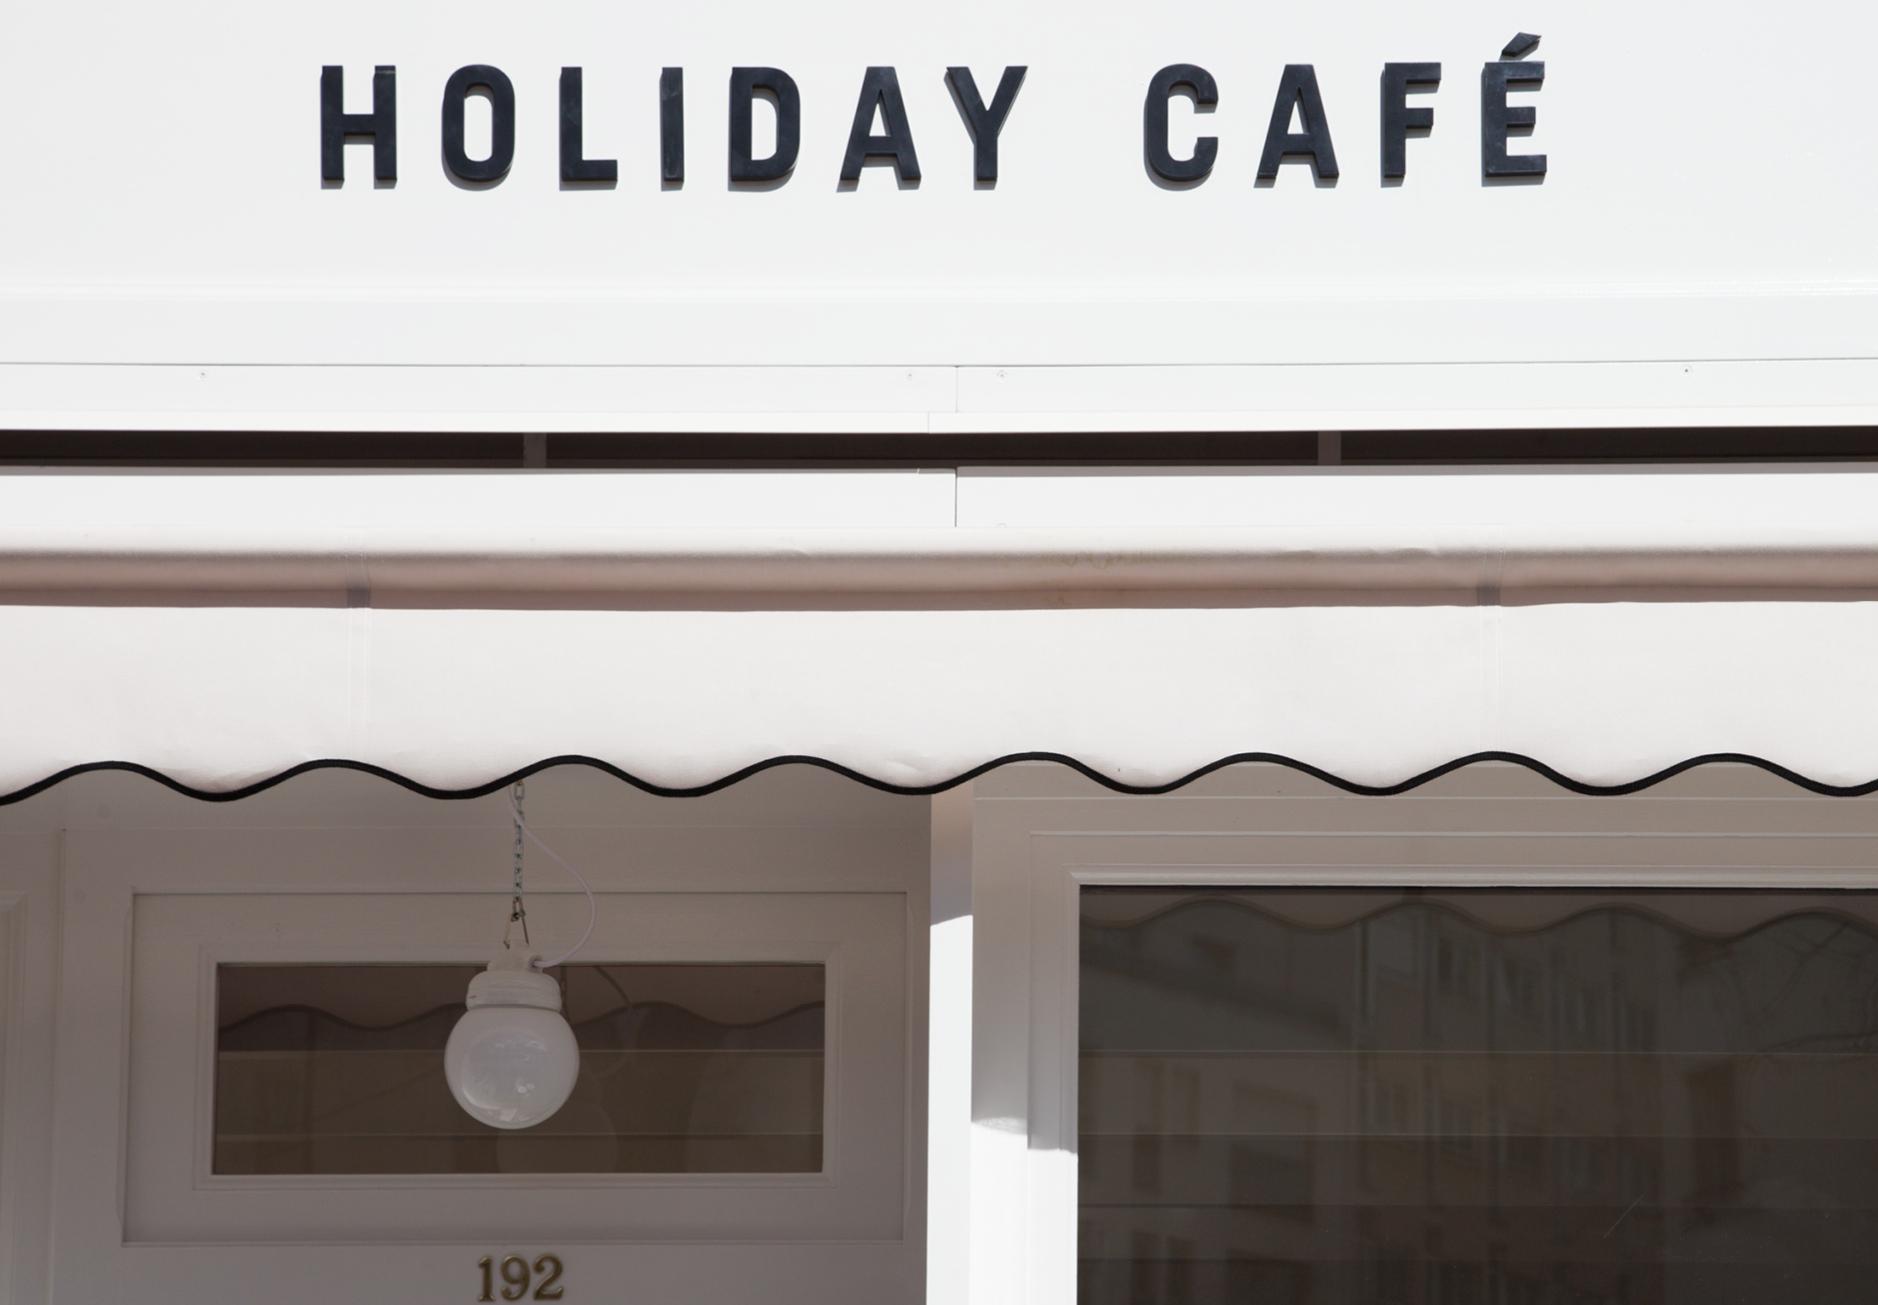 HOLIDAY CAFE